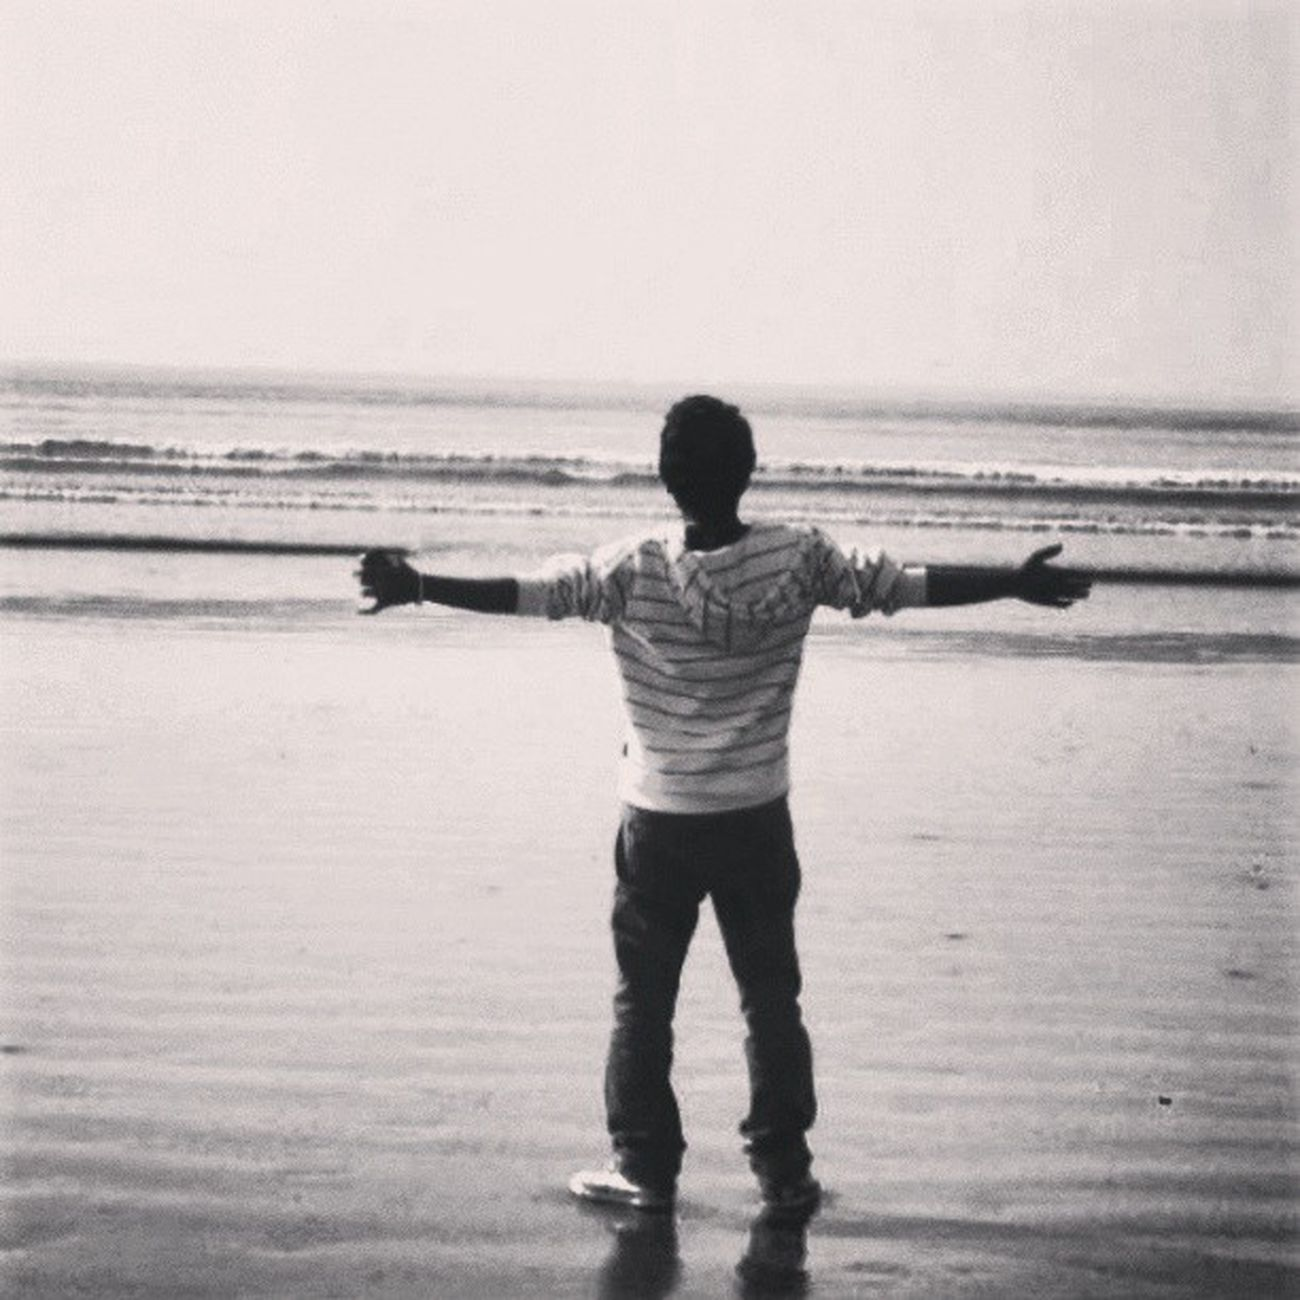 Taken at beach :D Beach Pakistan Karachi Seaview Cool Blacknwhite Awesome Old